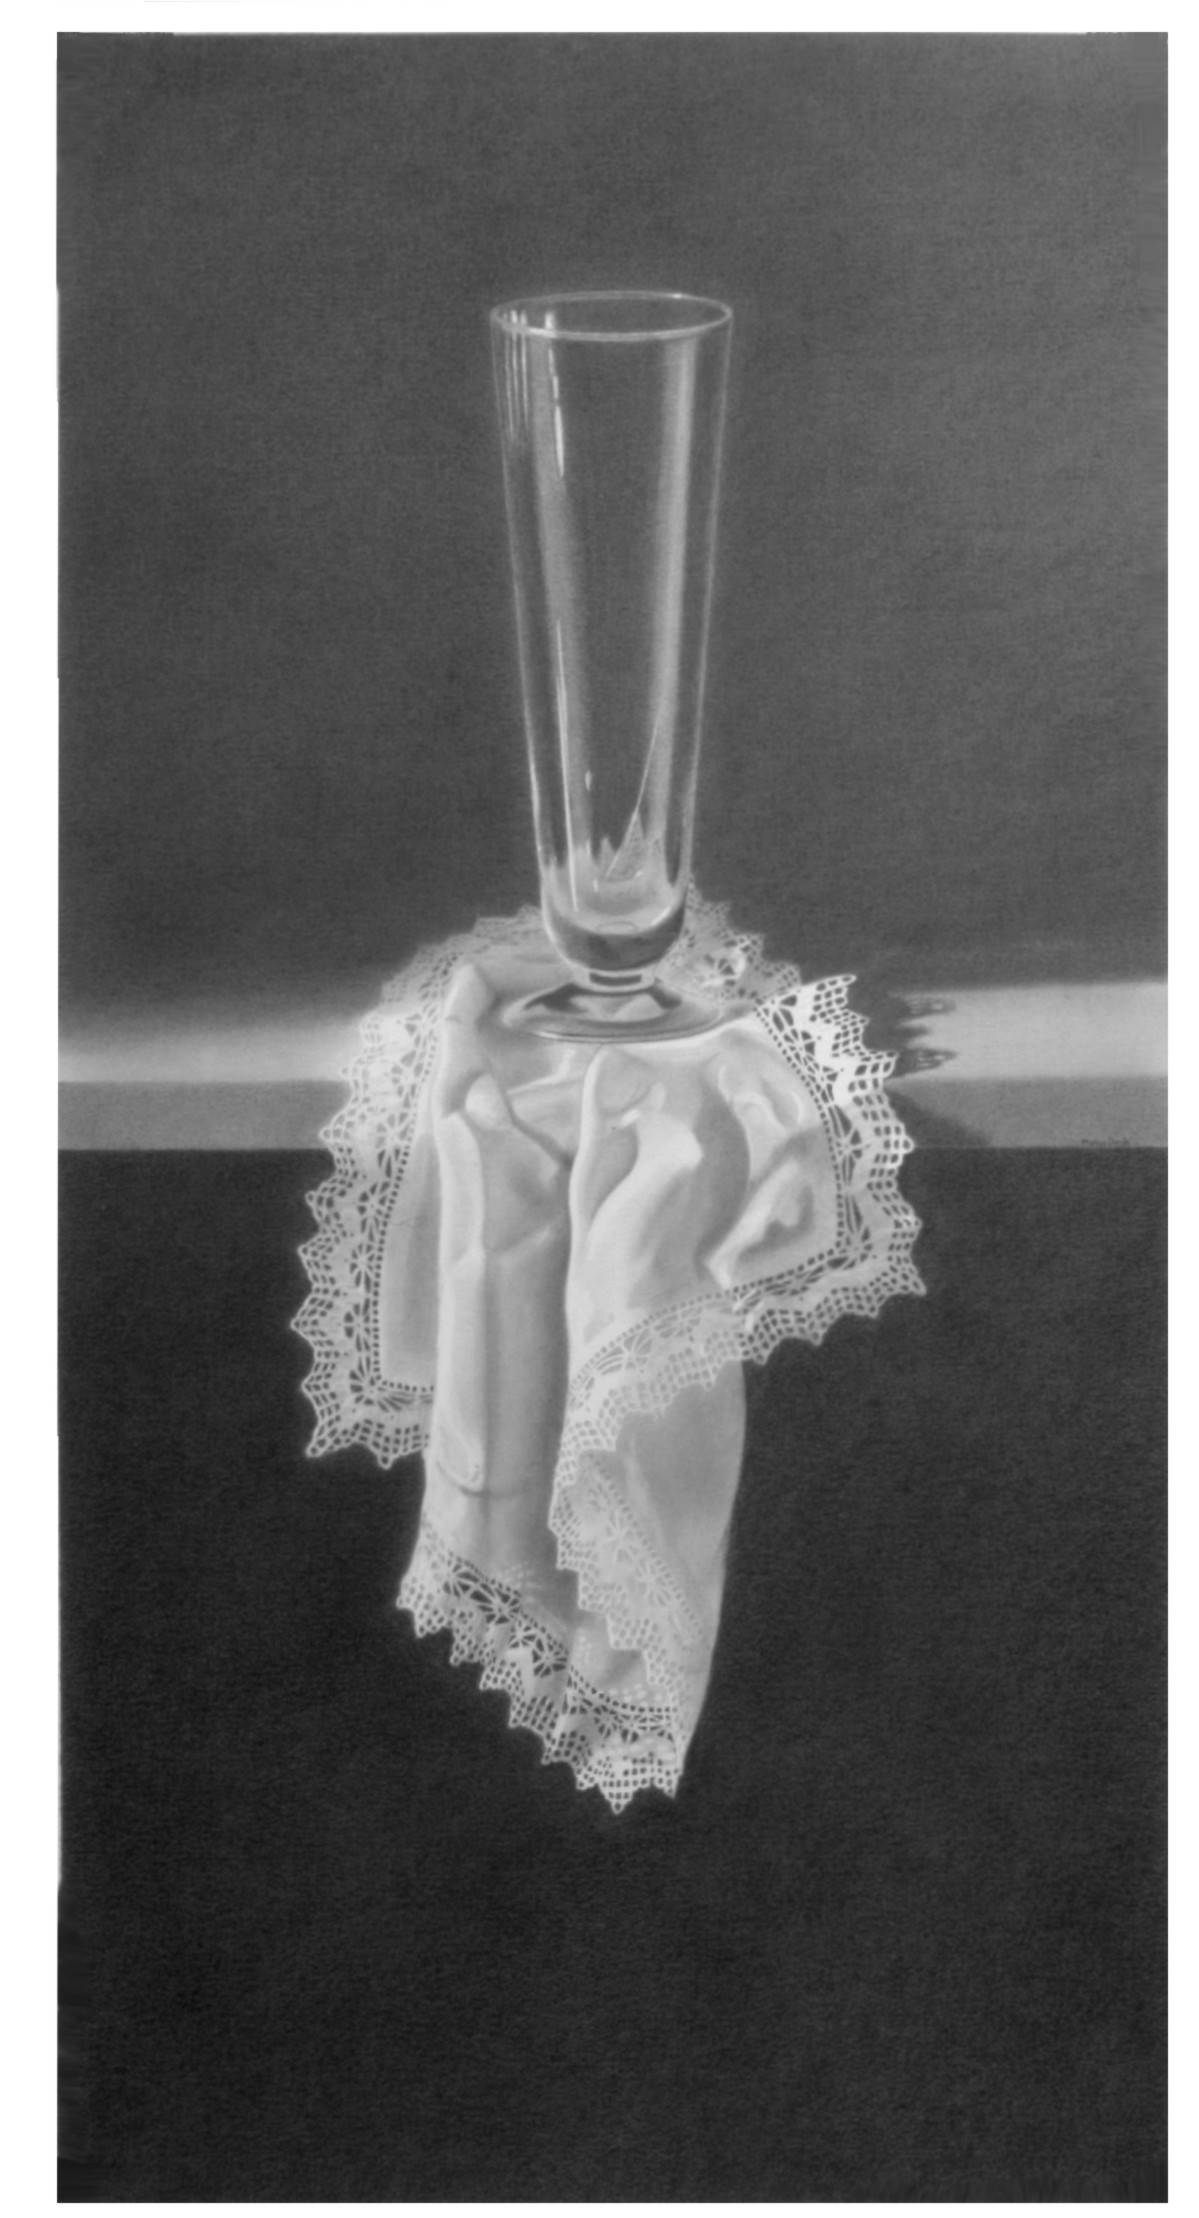 Copa sobre un pañuelo con puntilla